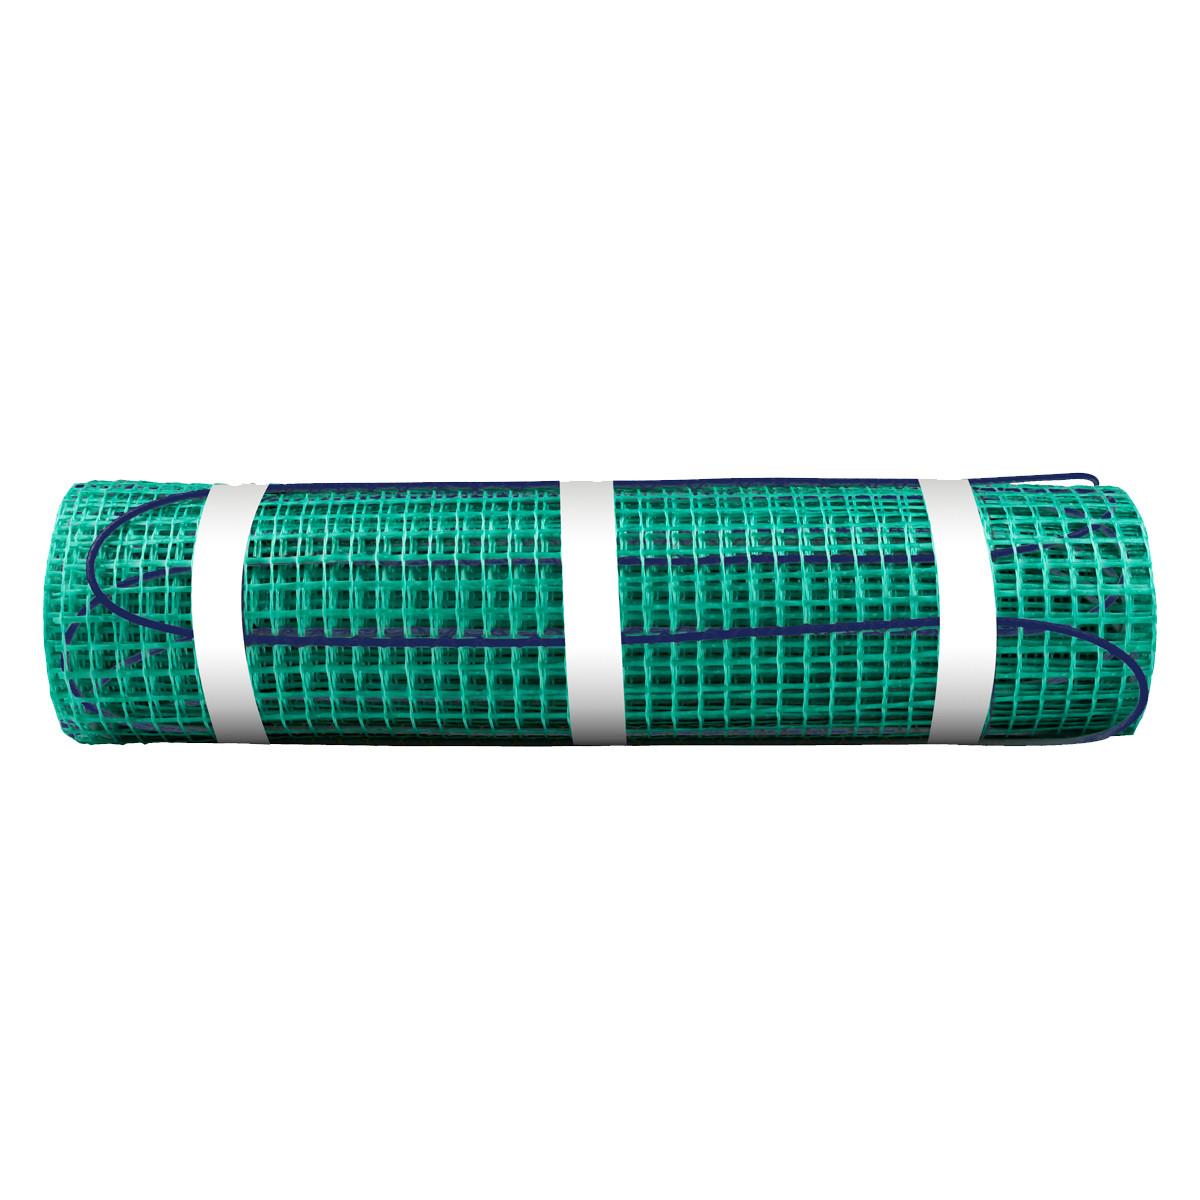 WarmlyYours TRT240-1.5x17 TempZone 240V 1.6A 1.5 Foot x 17 Foot Flex Roll